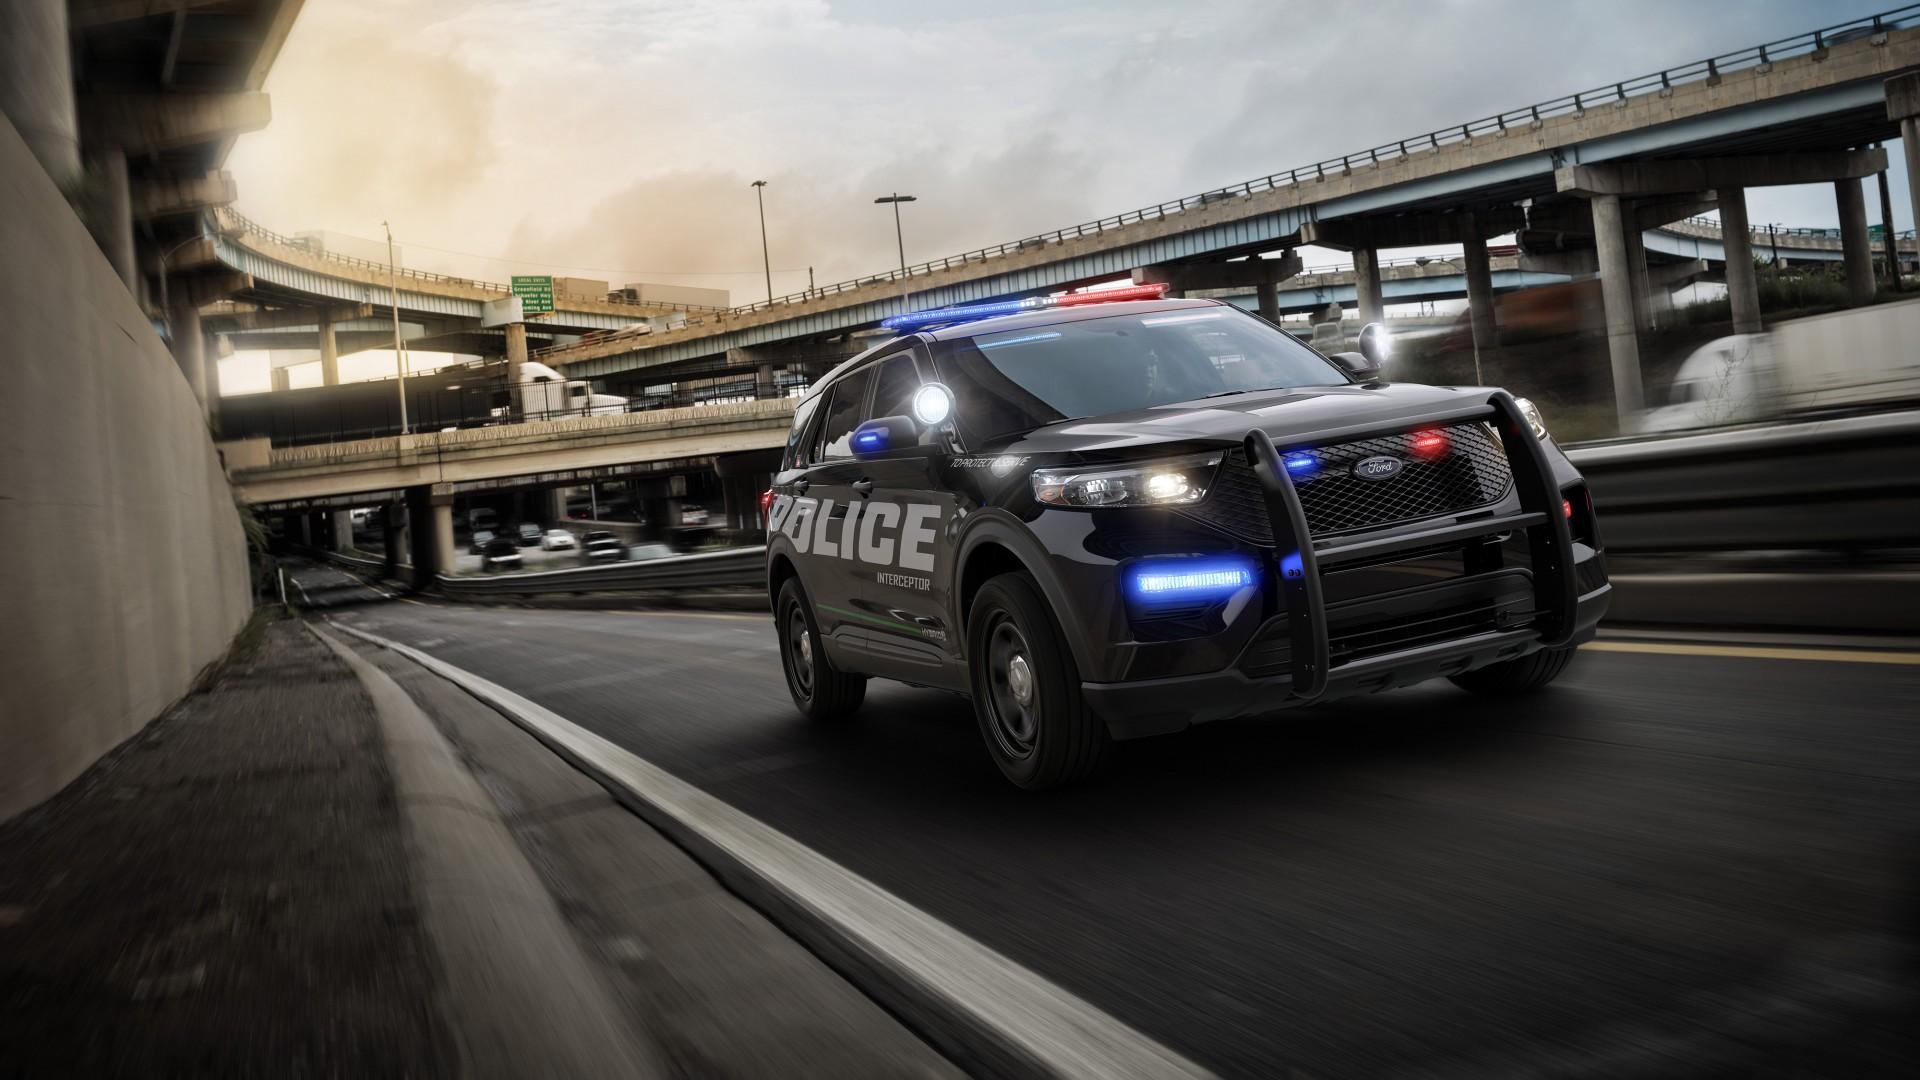 police ford interceptor utility 1080 4k 1920 hd wallpapers